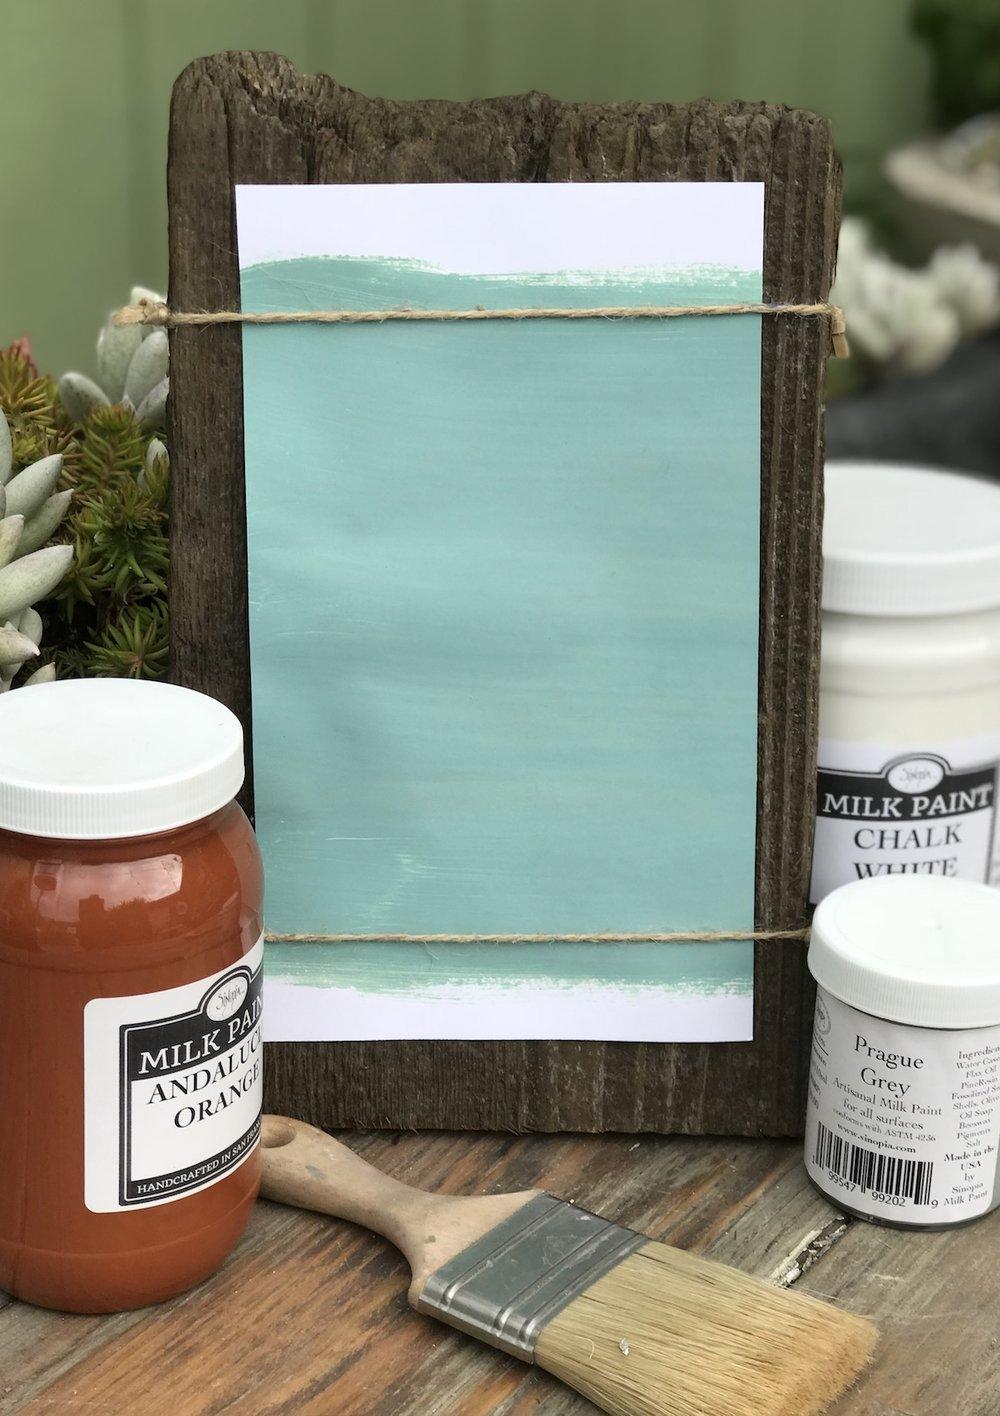 Alcazar Turquoise Milk Paint